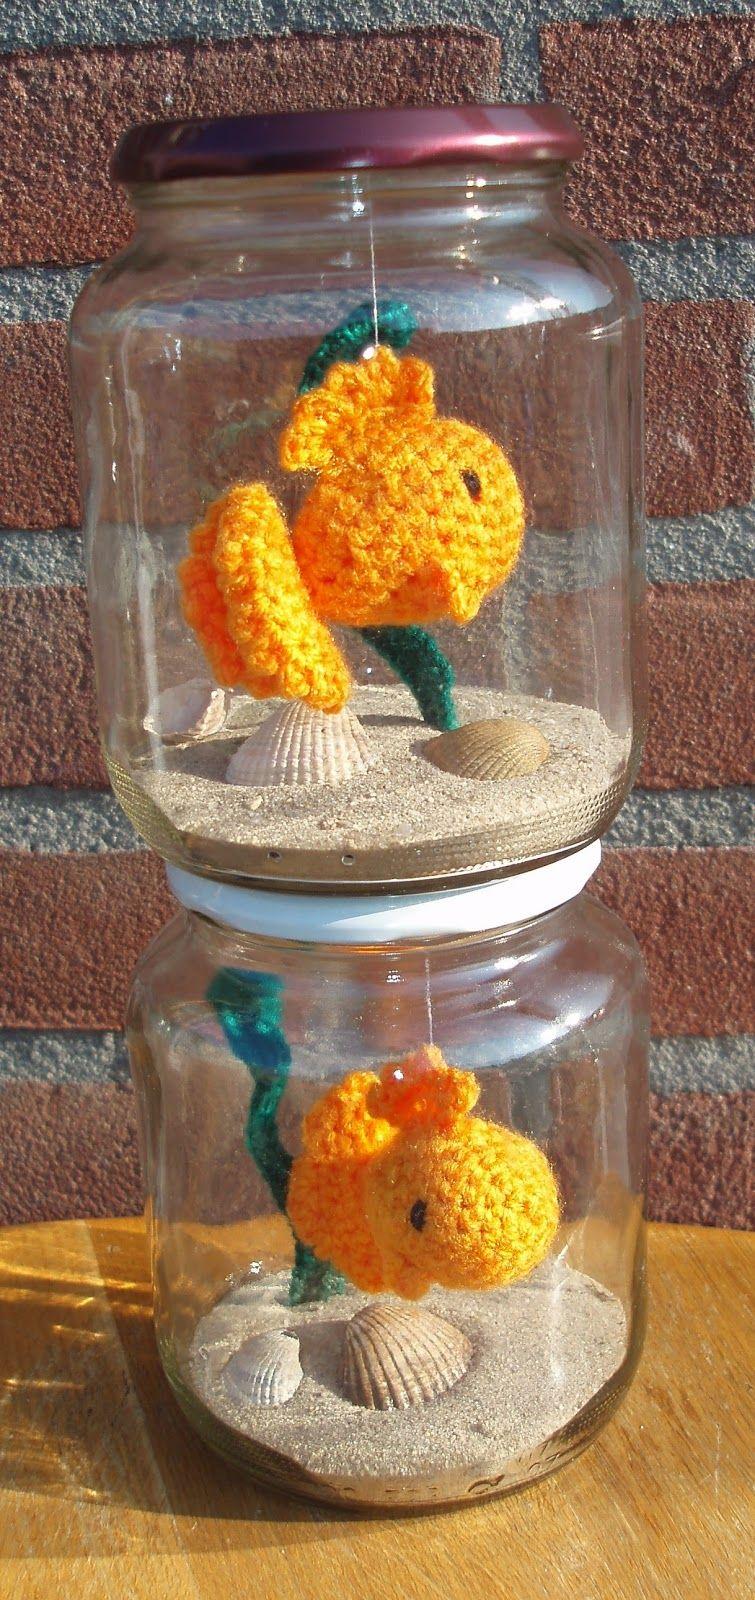 Amigurumi crochet sels small gifts fish bowl for Small fish bowl